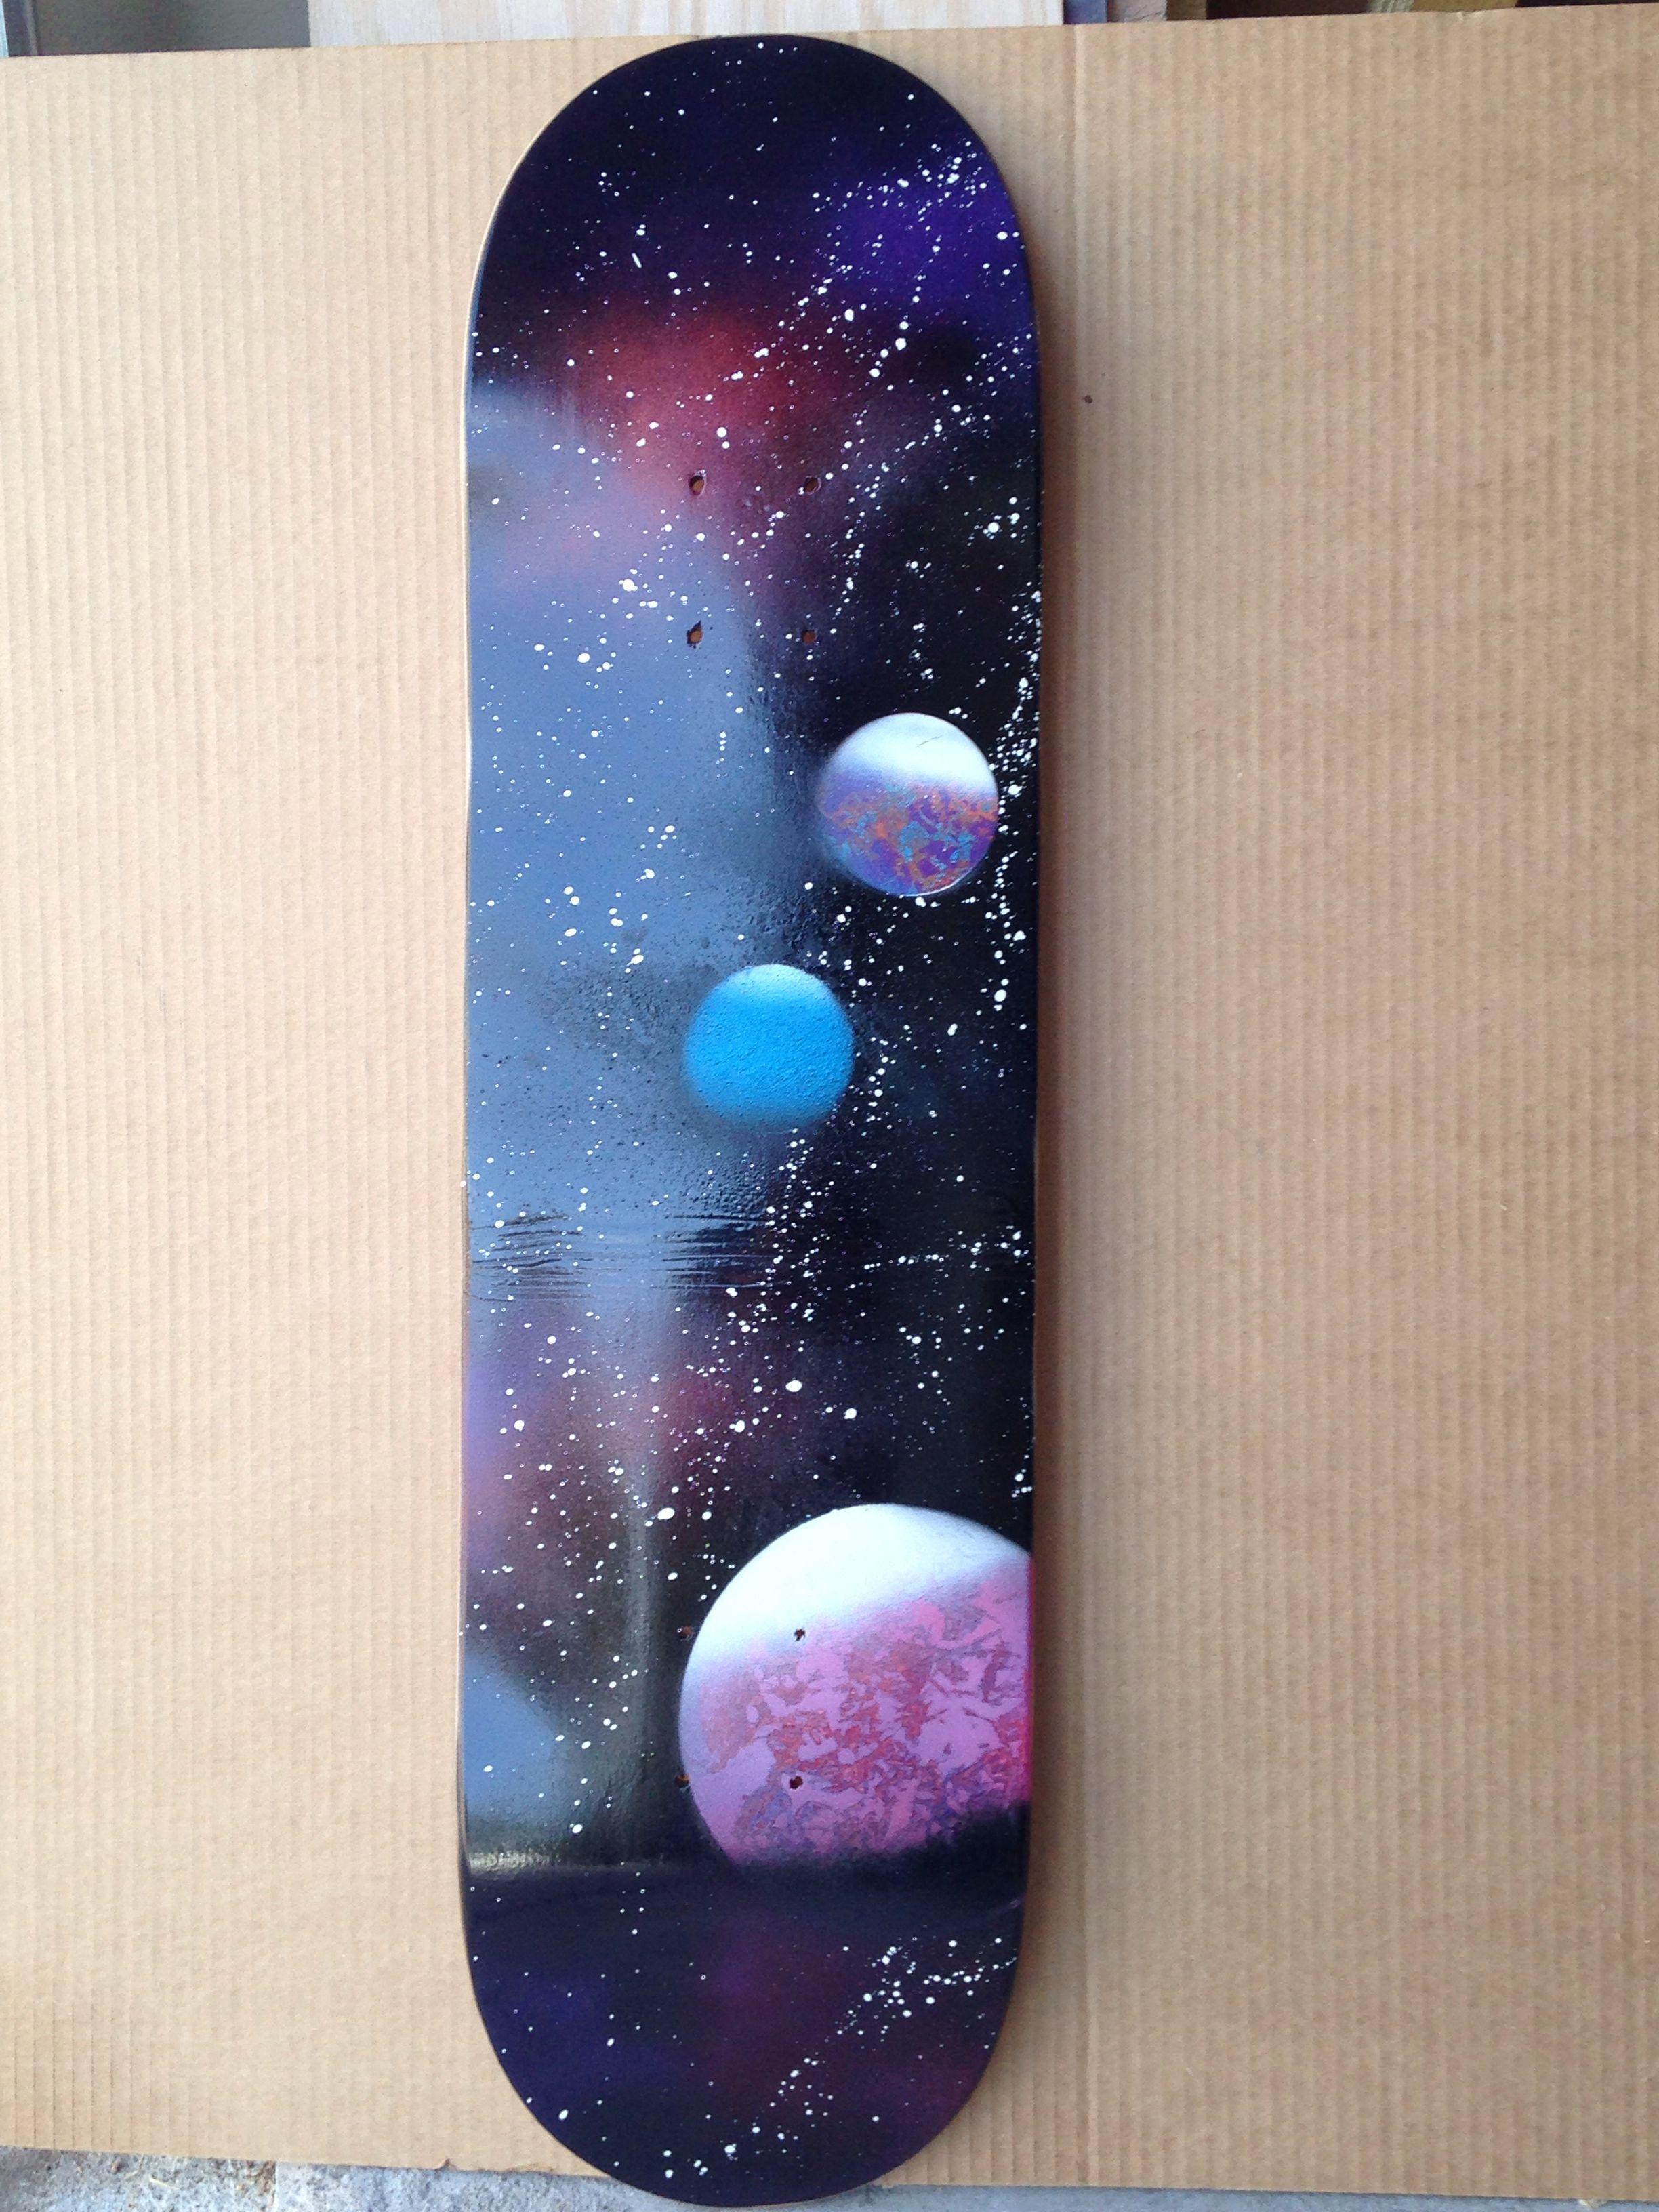 Homemade. skateboard. Spray paint. Art. Galaxy art. To buy ...